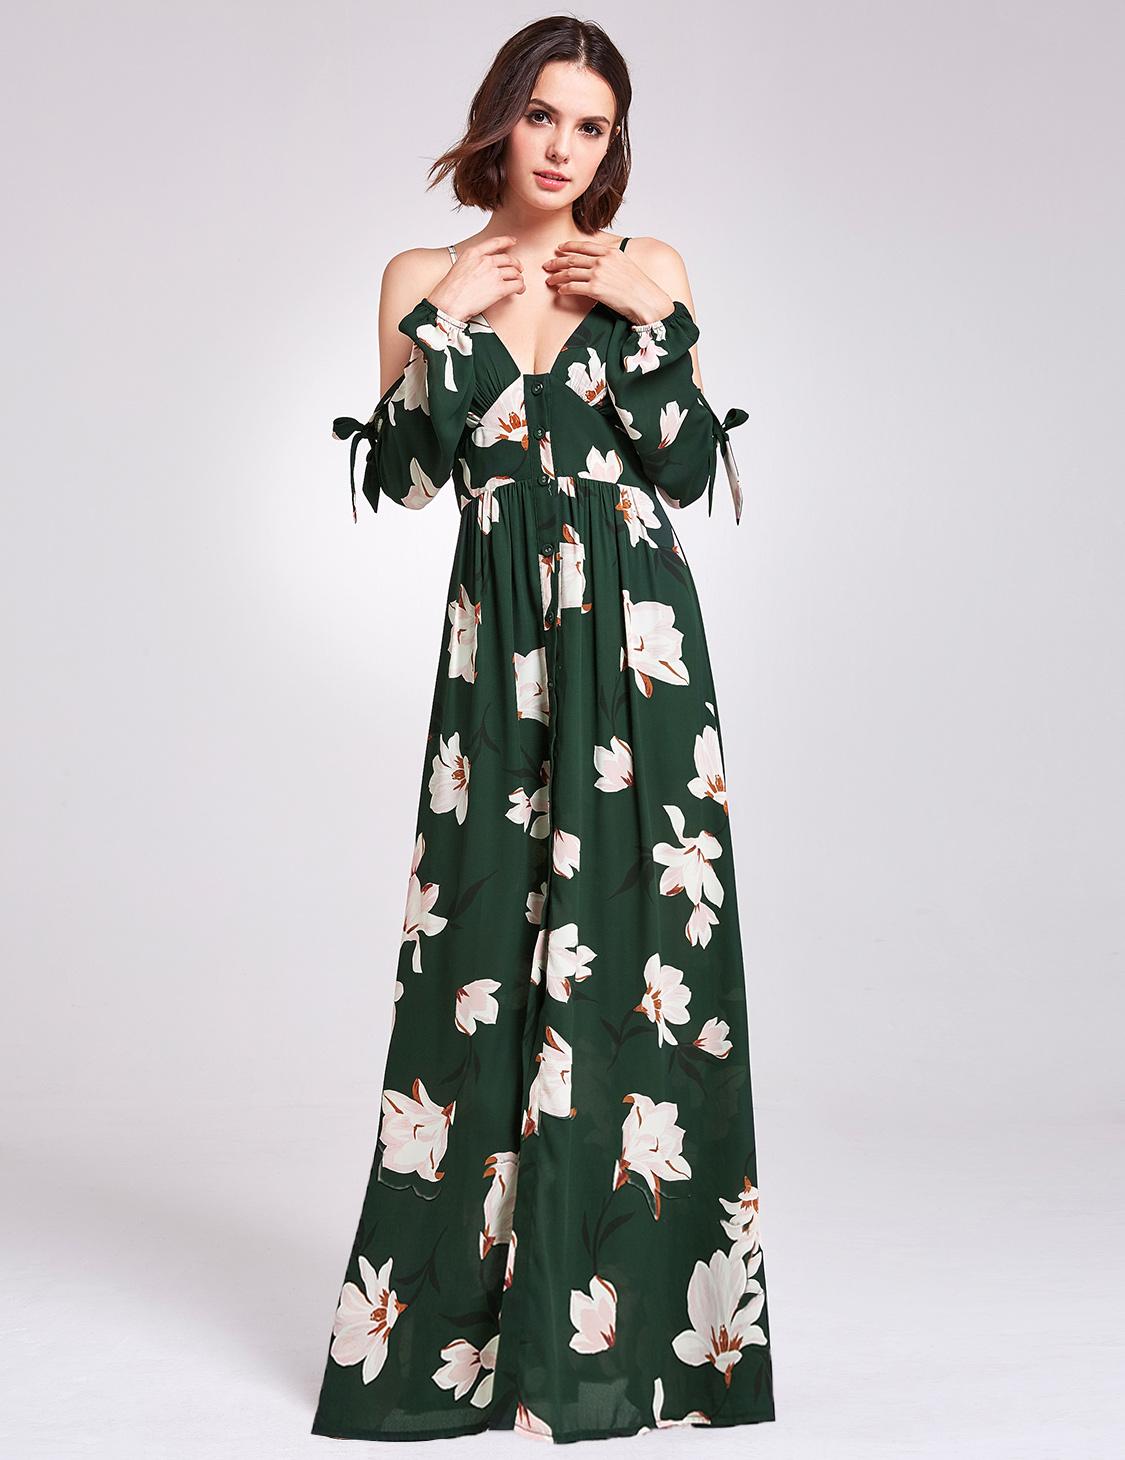 Alisa-Pan-Summer-Dresses-Floral-Print-Beach-Long-Women-Party-Dress-07178